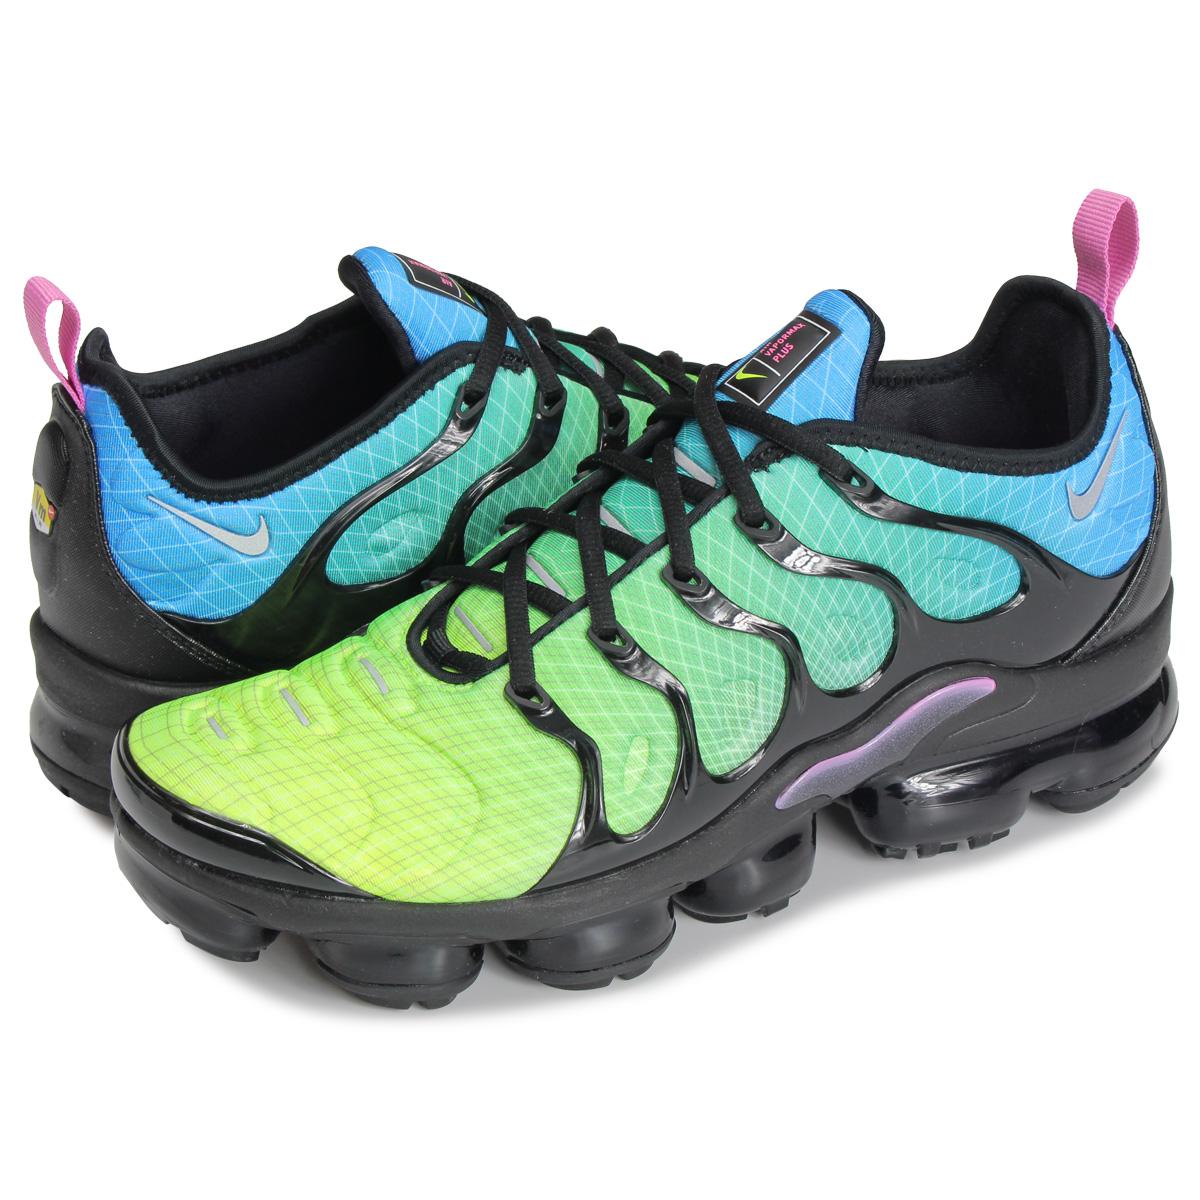 pretty nice 8edf7 0de51 Nike NIKE air vapor max plus sneakers men AIR VAPORMAX PLUS green  924,453-302 [197]